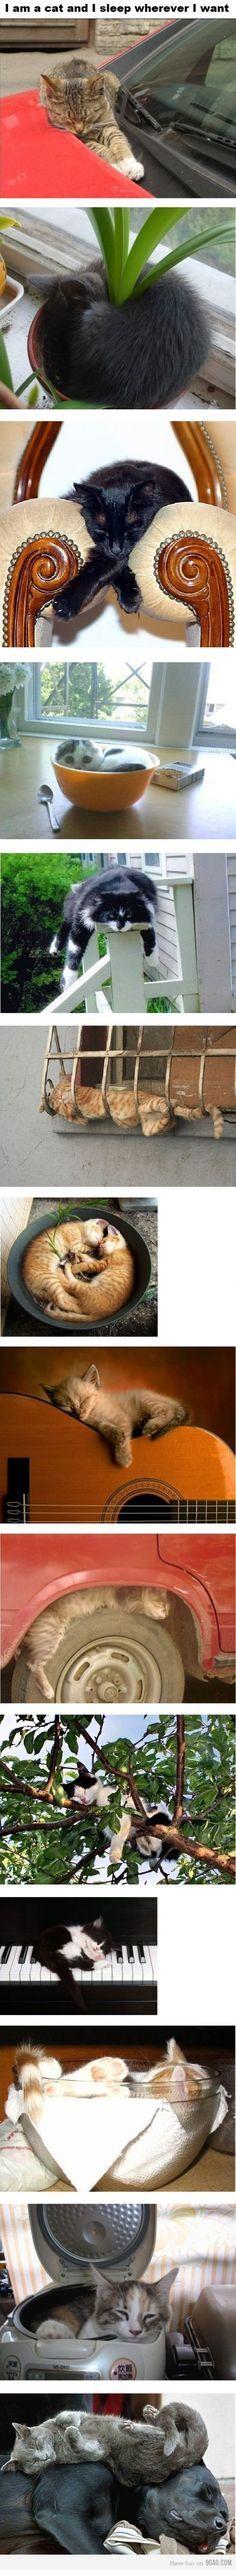 Kitties be crazy